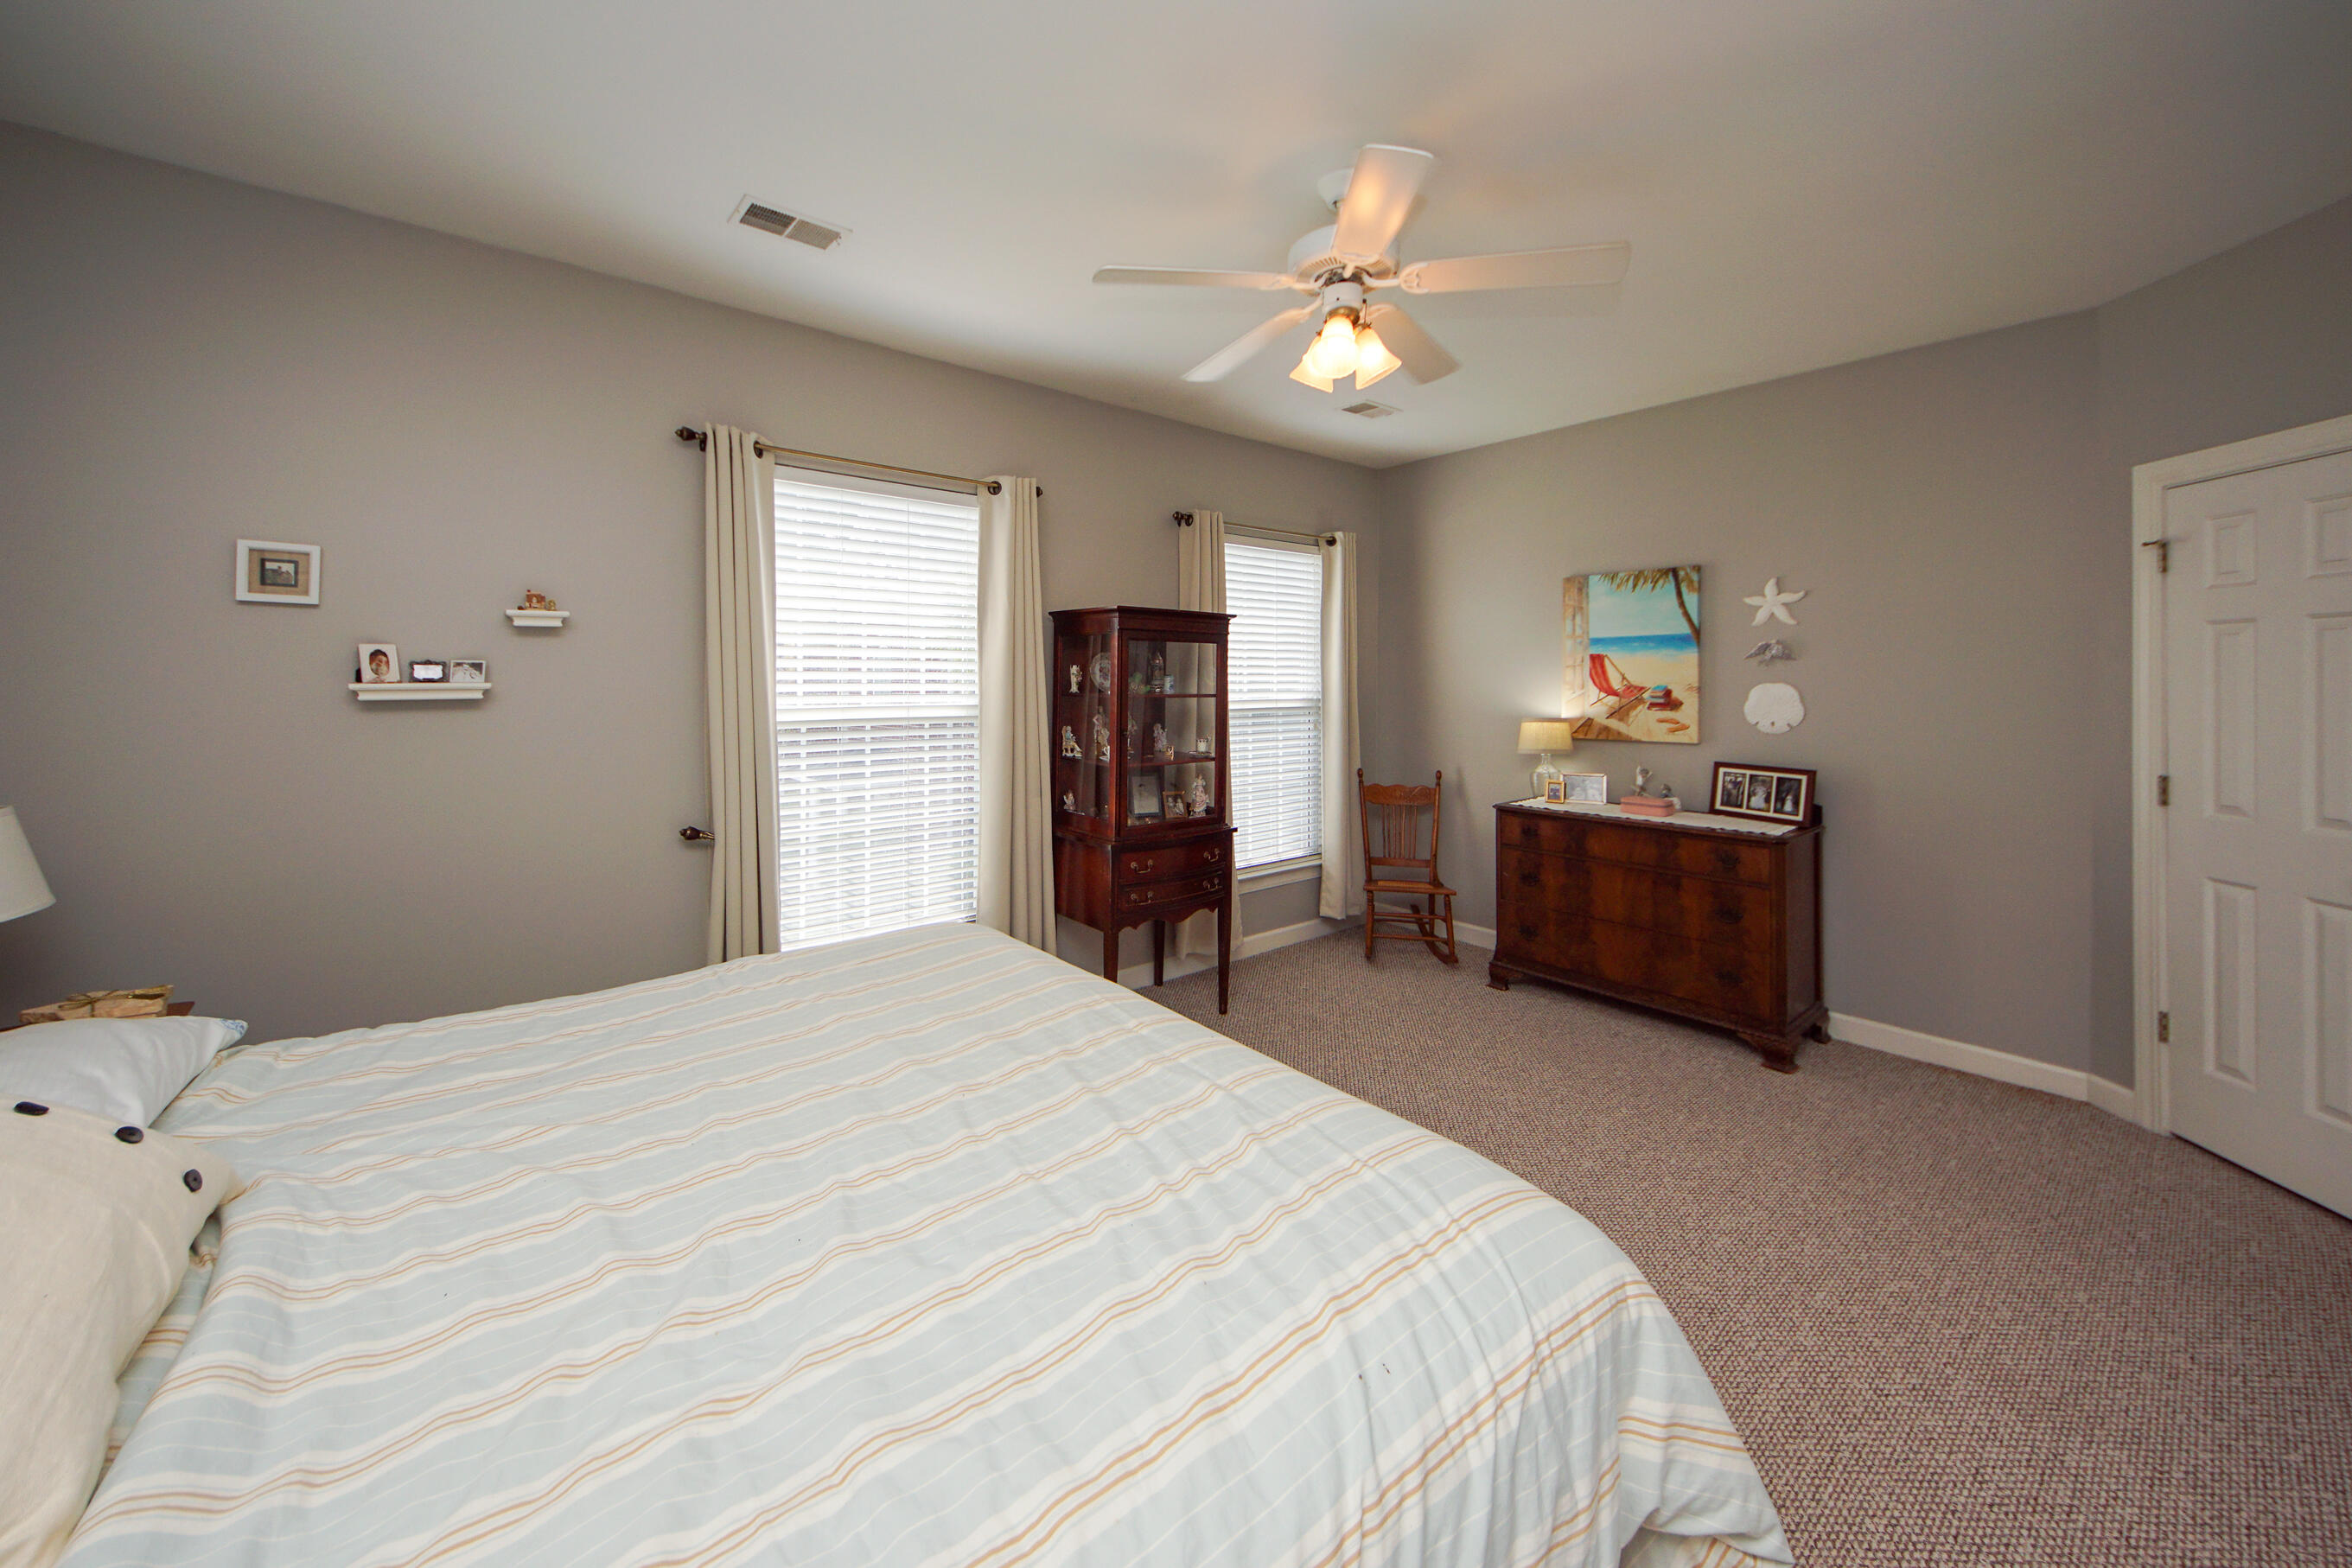 Dunes West Homes For Sale - 1631 Camfield, Mount Pleasant, SC - 18